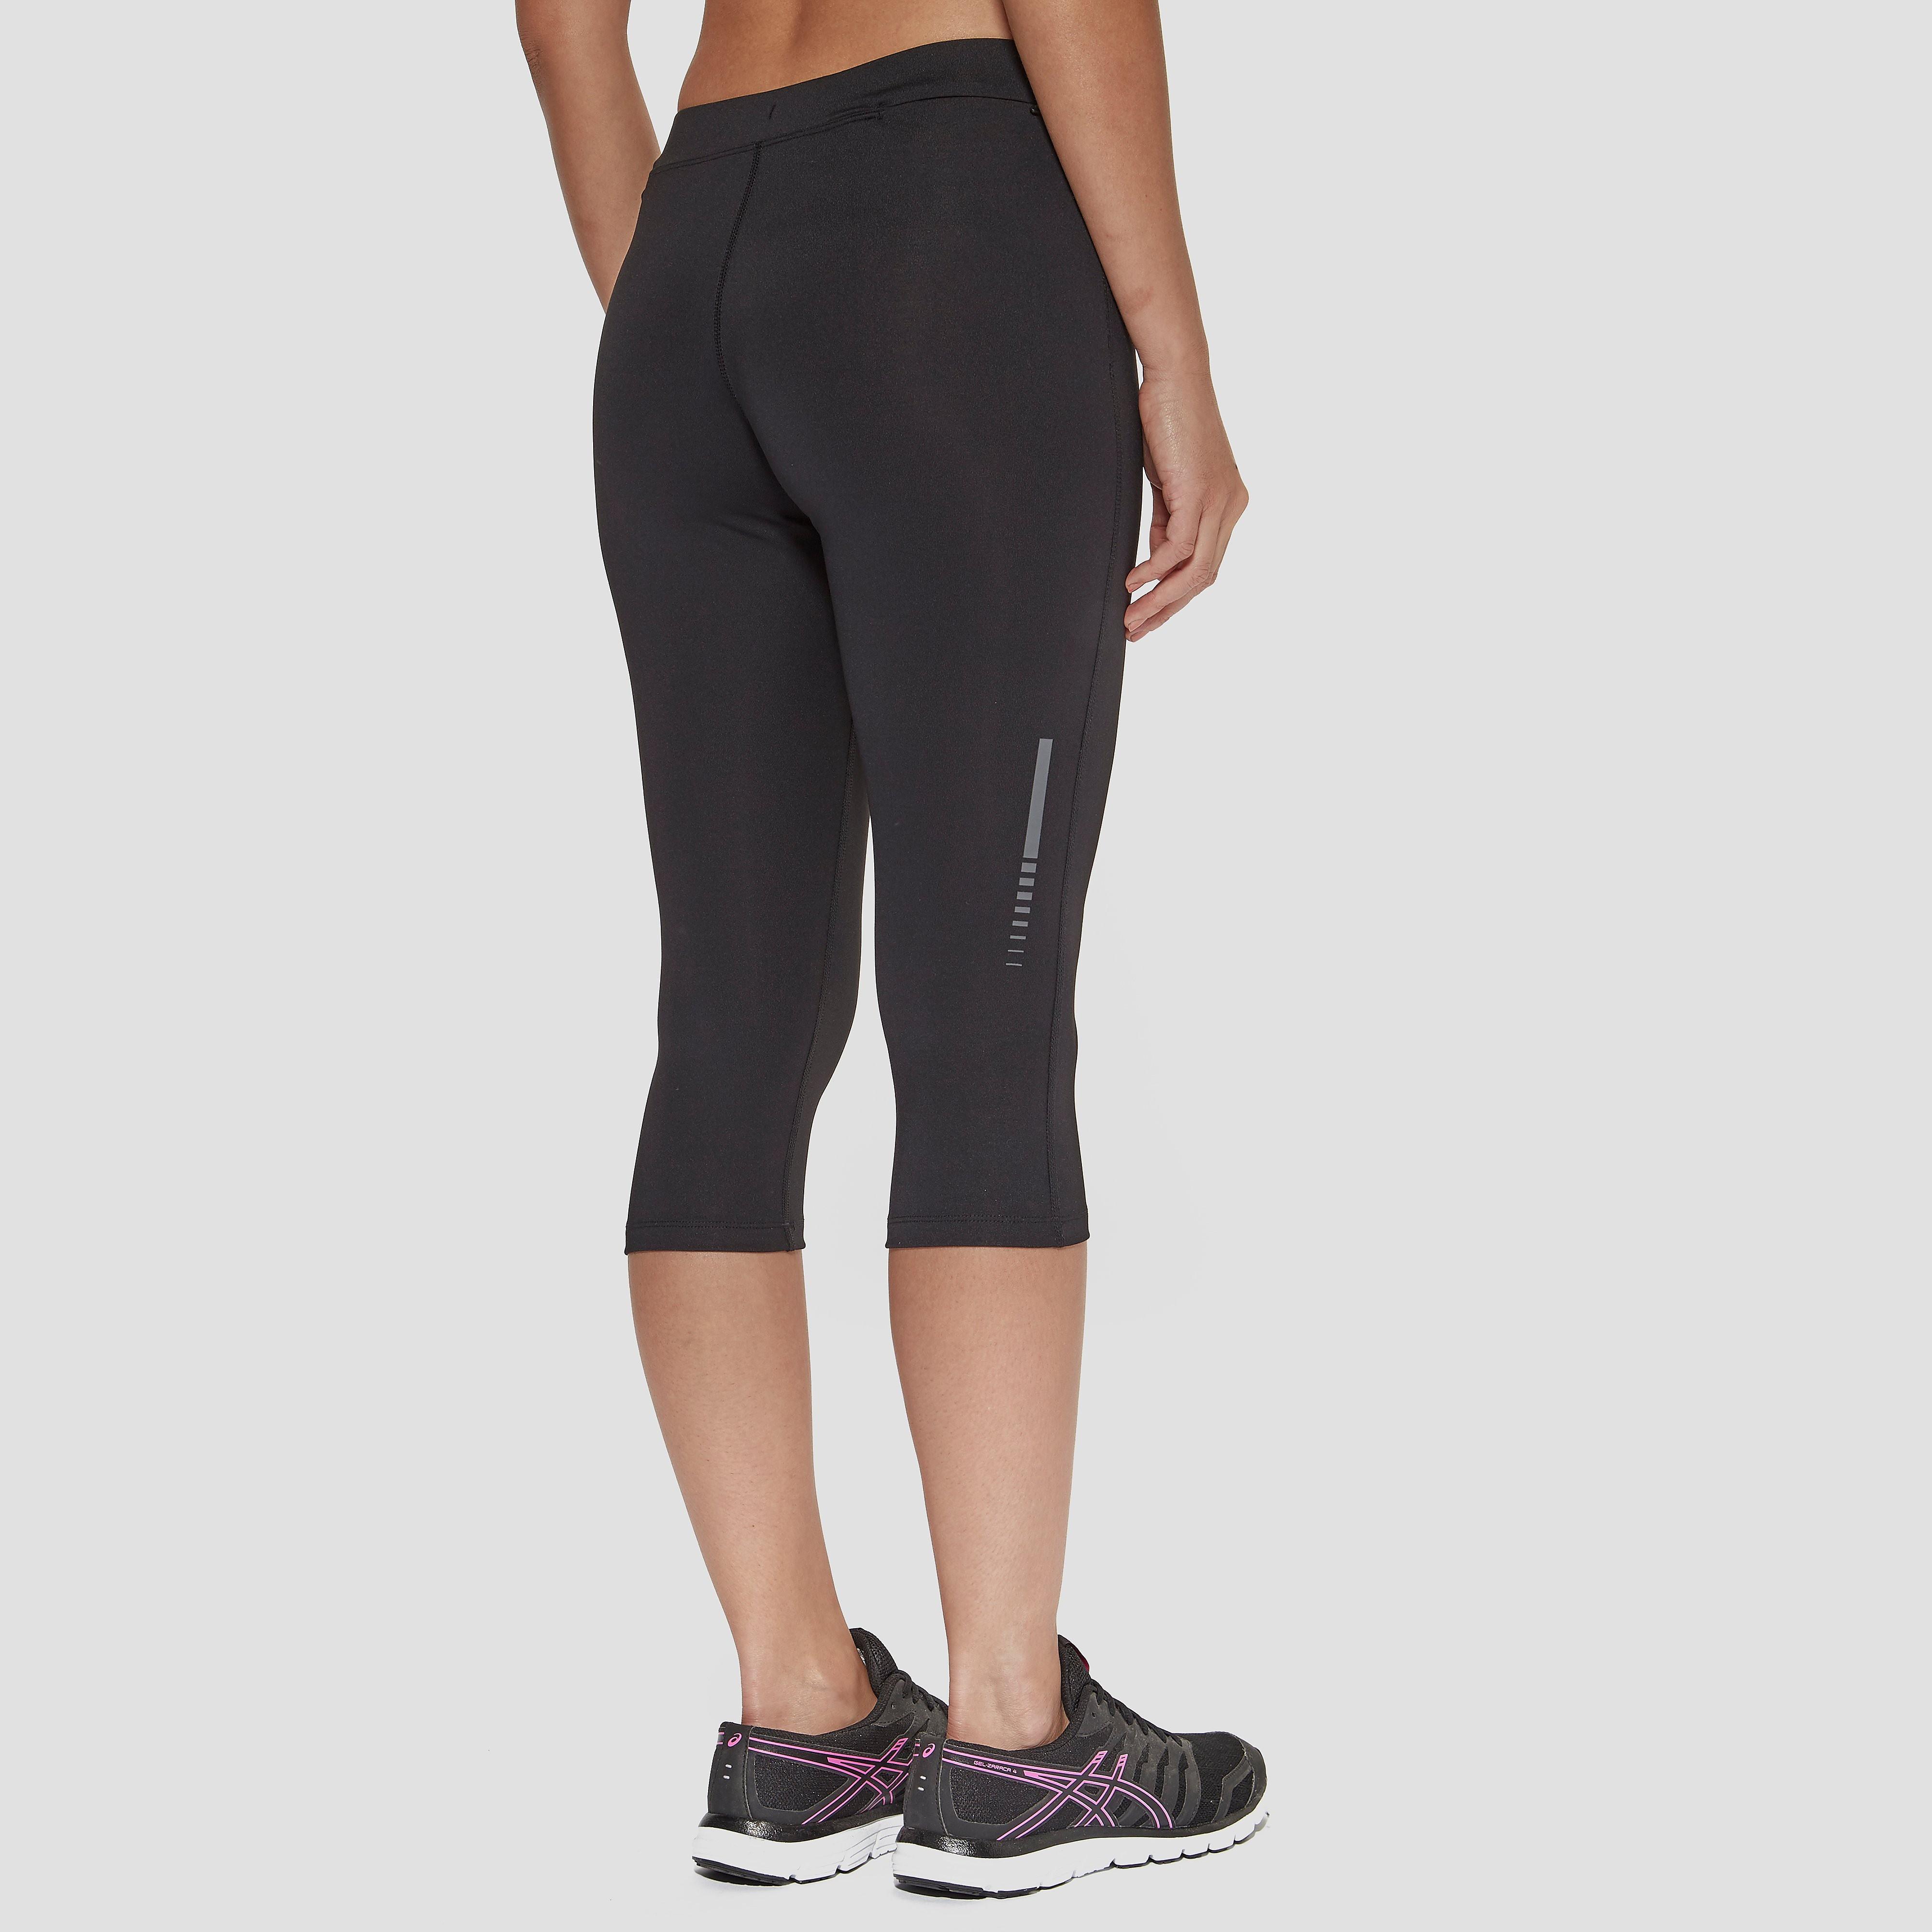 ASICS Knee Women's Running Tights